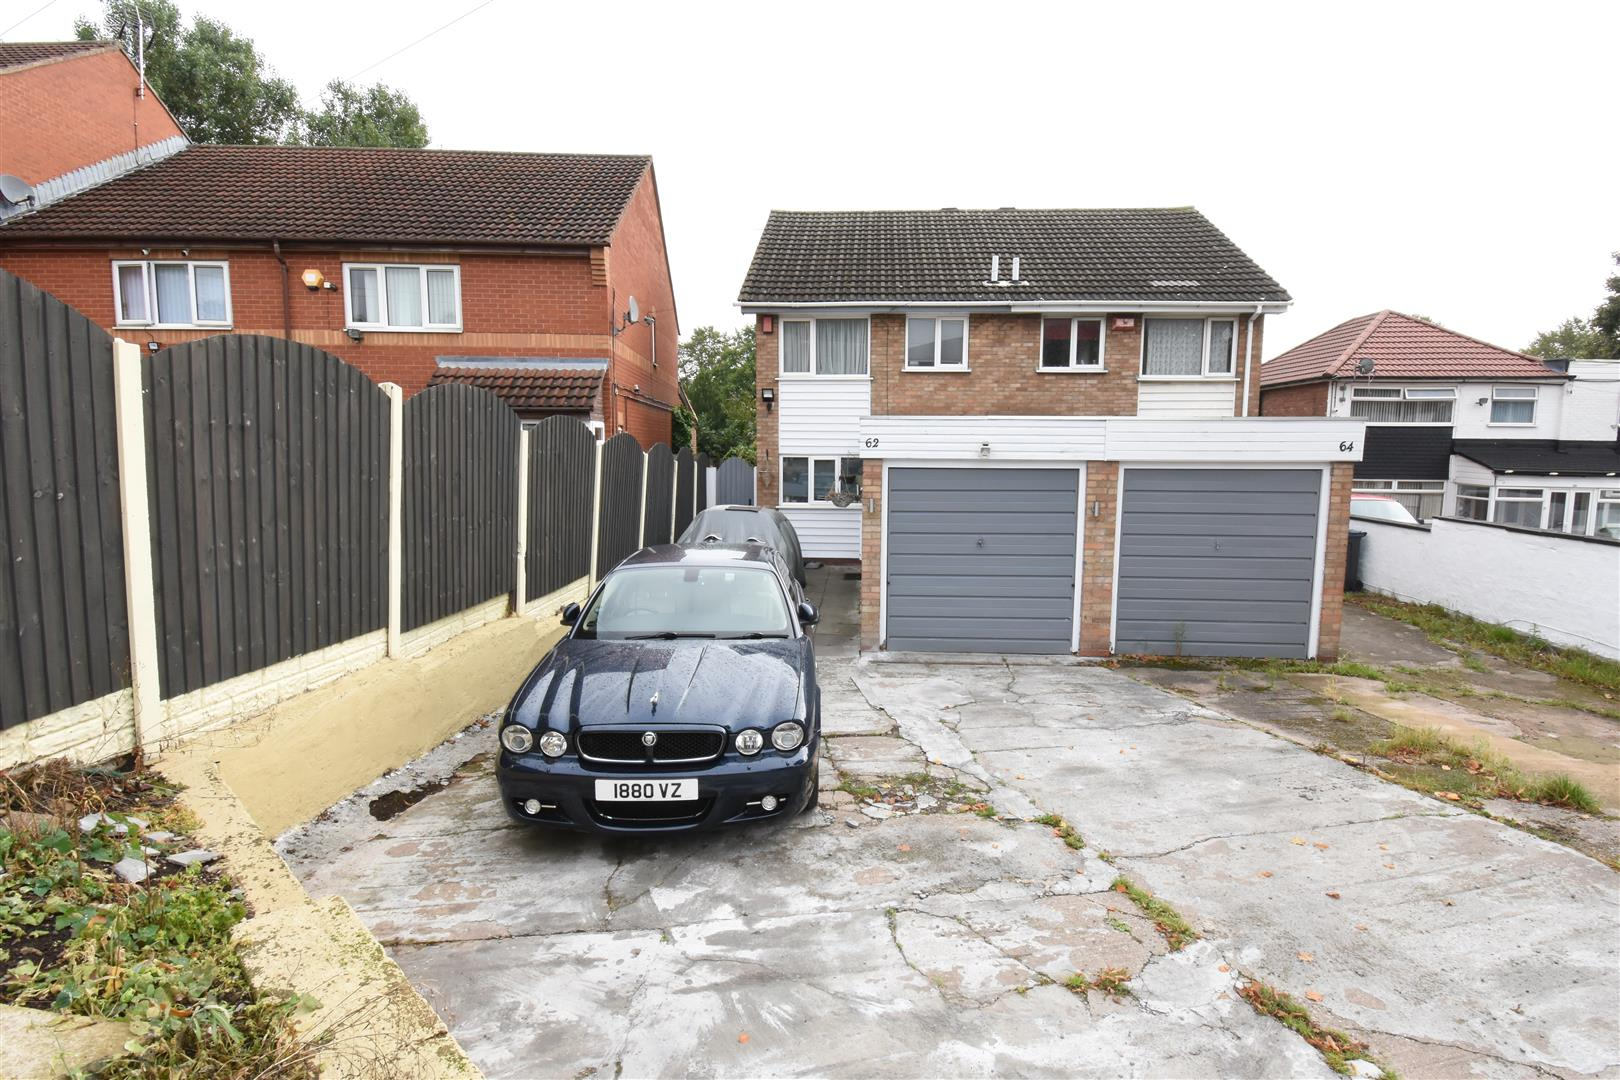 3 bed house for sale in Bankdale Road, Birmingham, B8